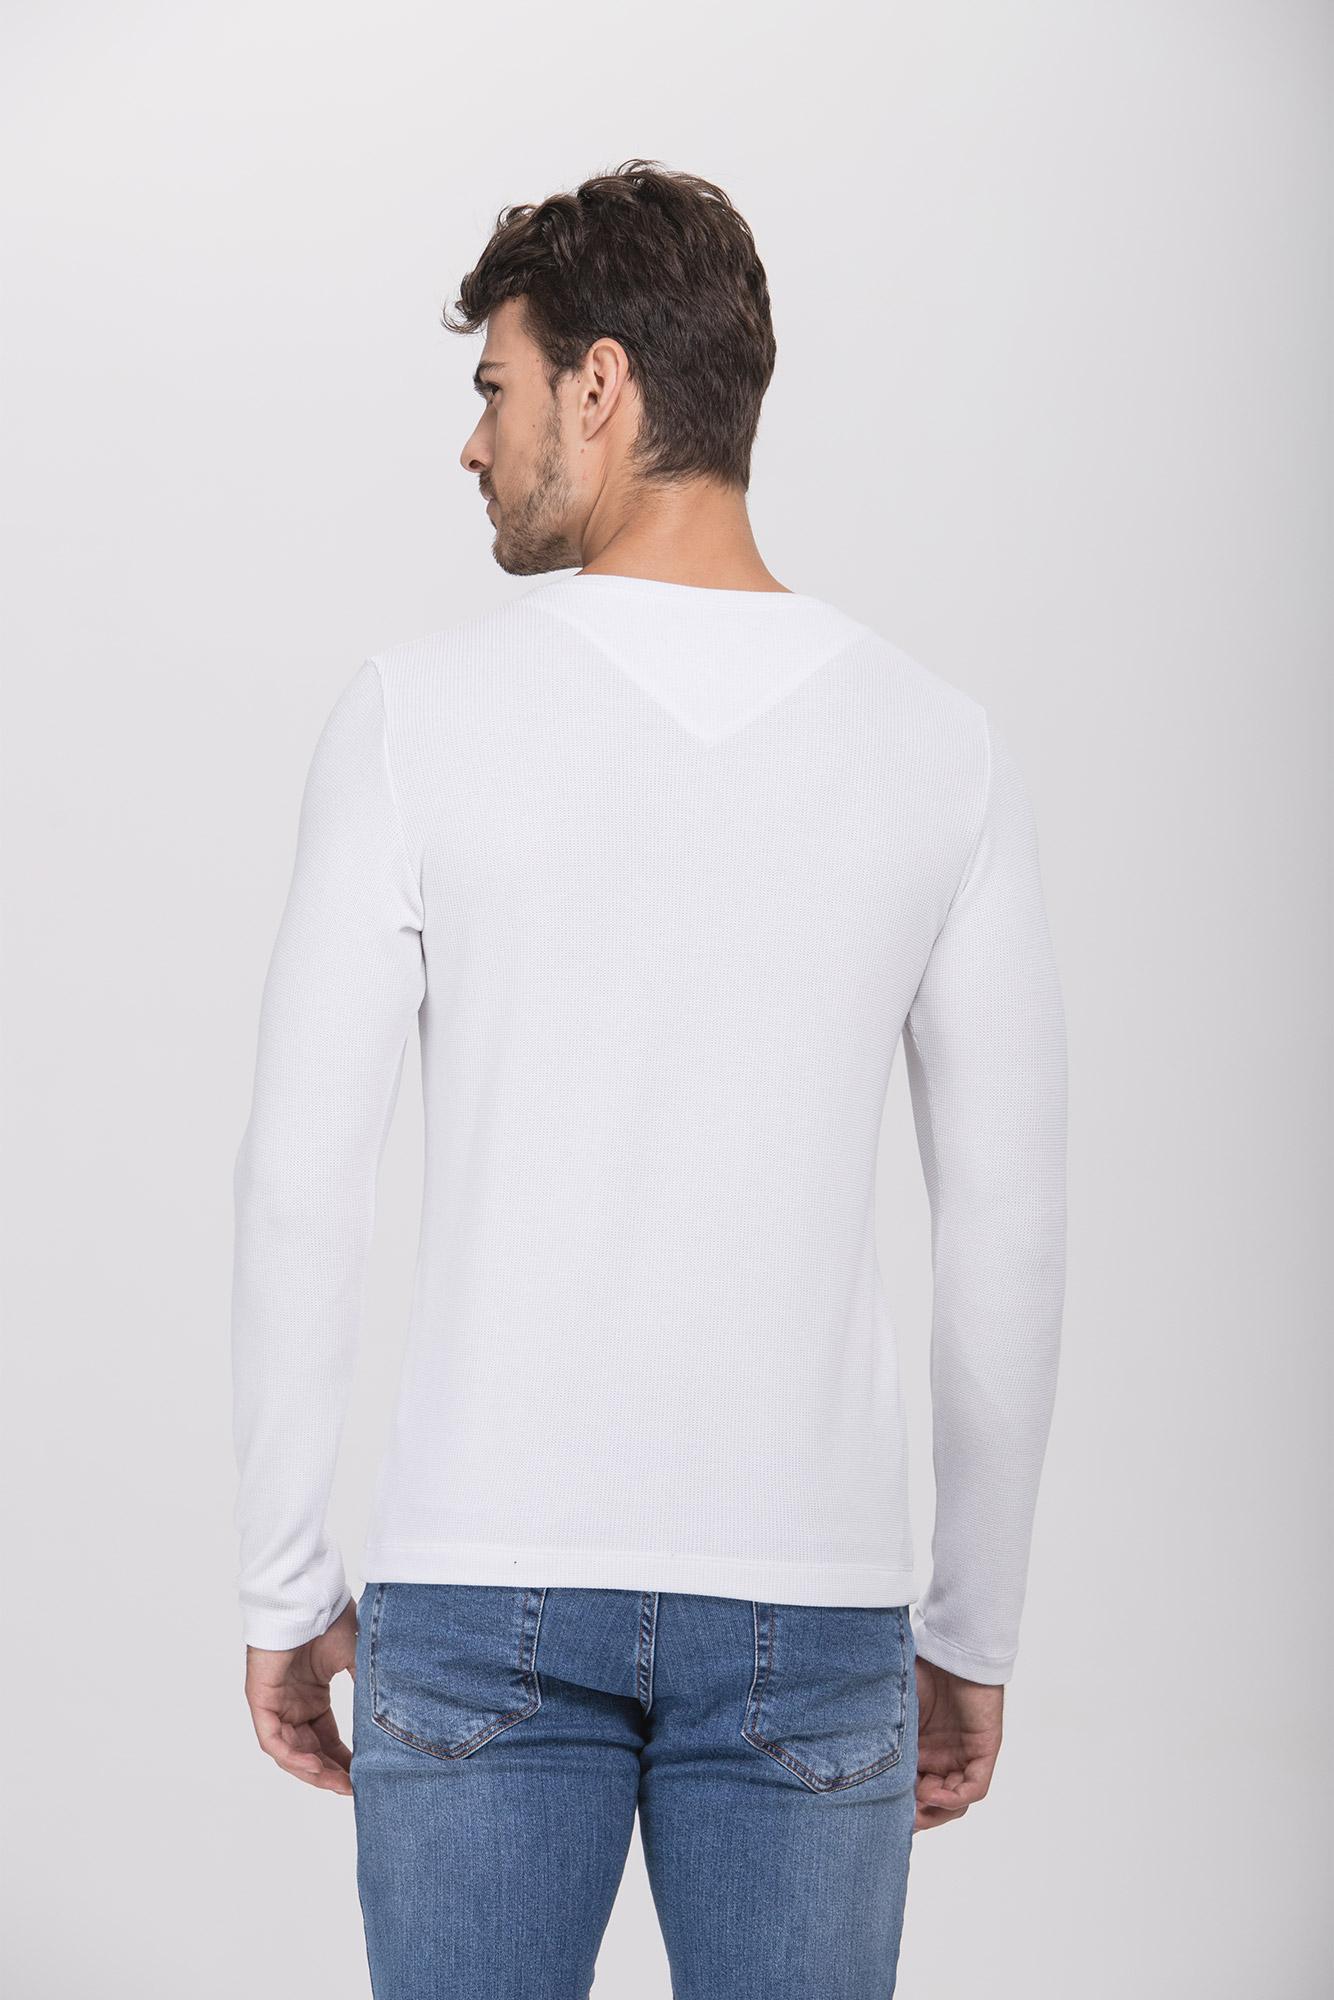 Camiseta ML Henley Branca